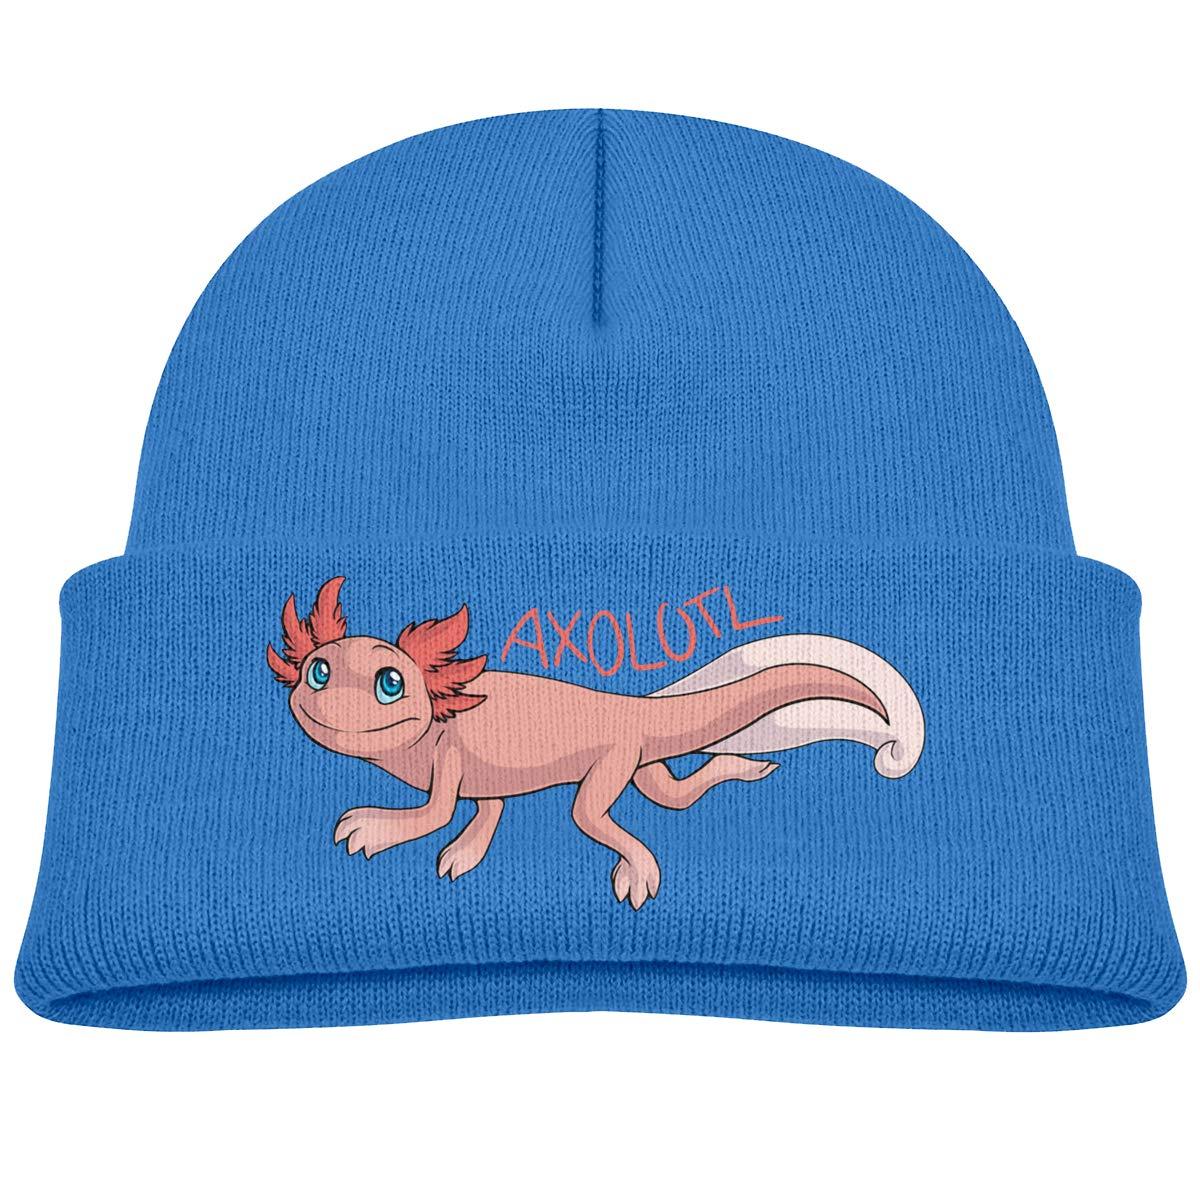 XKAWPC Axolotl Knitted Hat Winter Skull Beanies Toddlers Cuffed Plain Cap